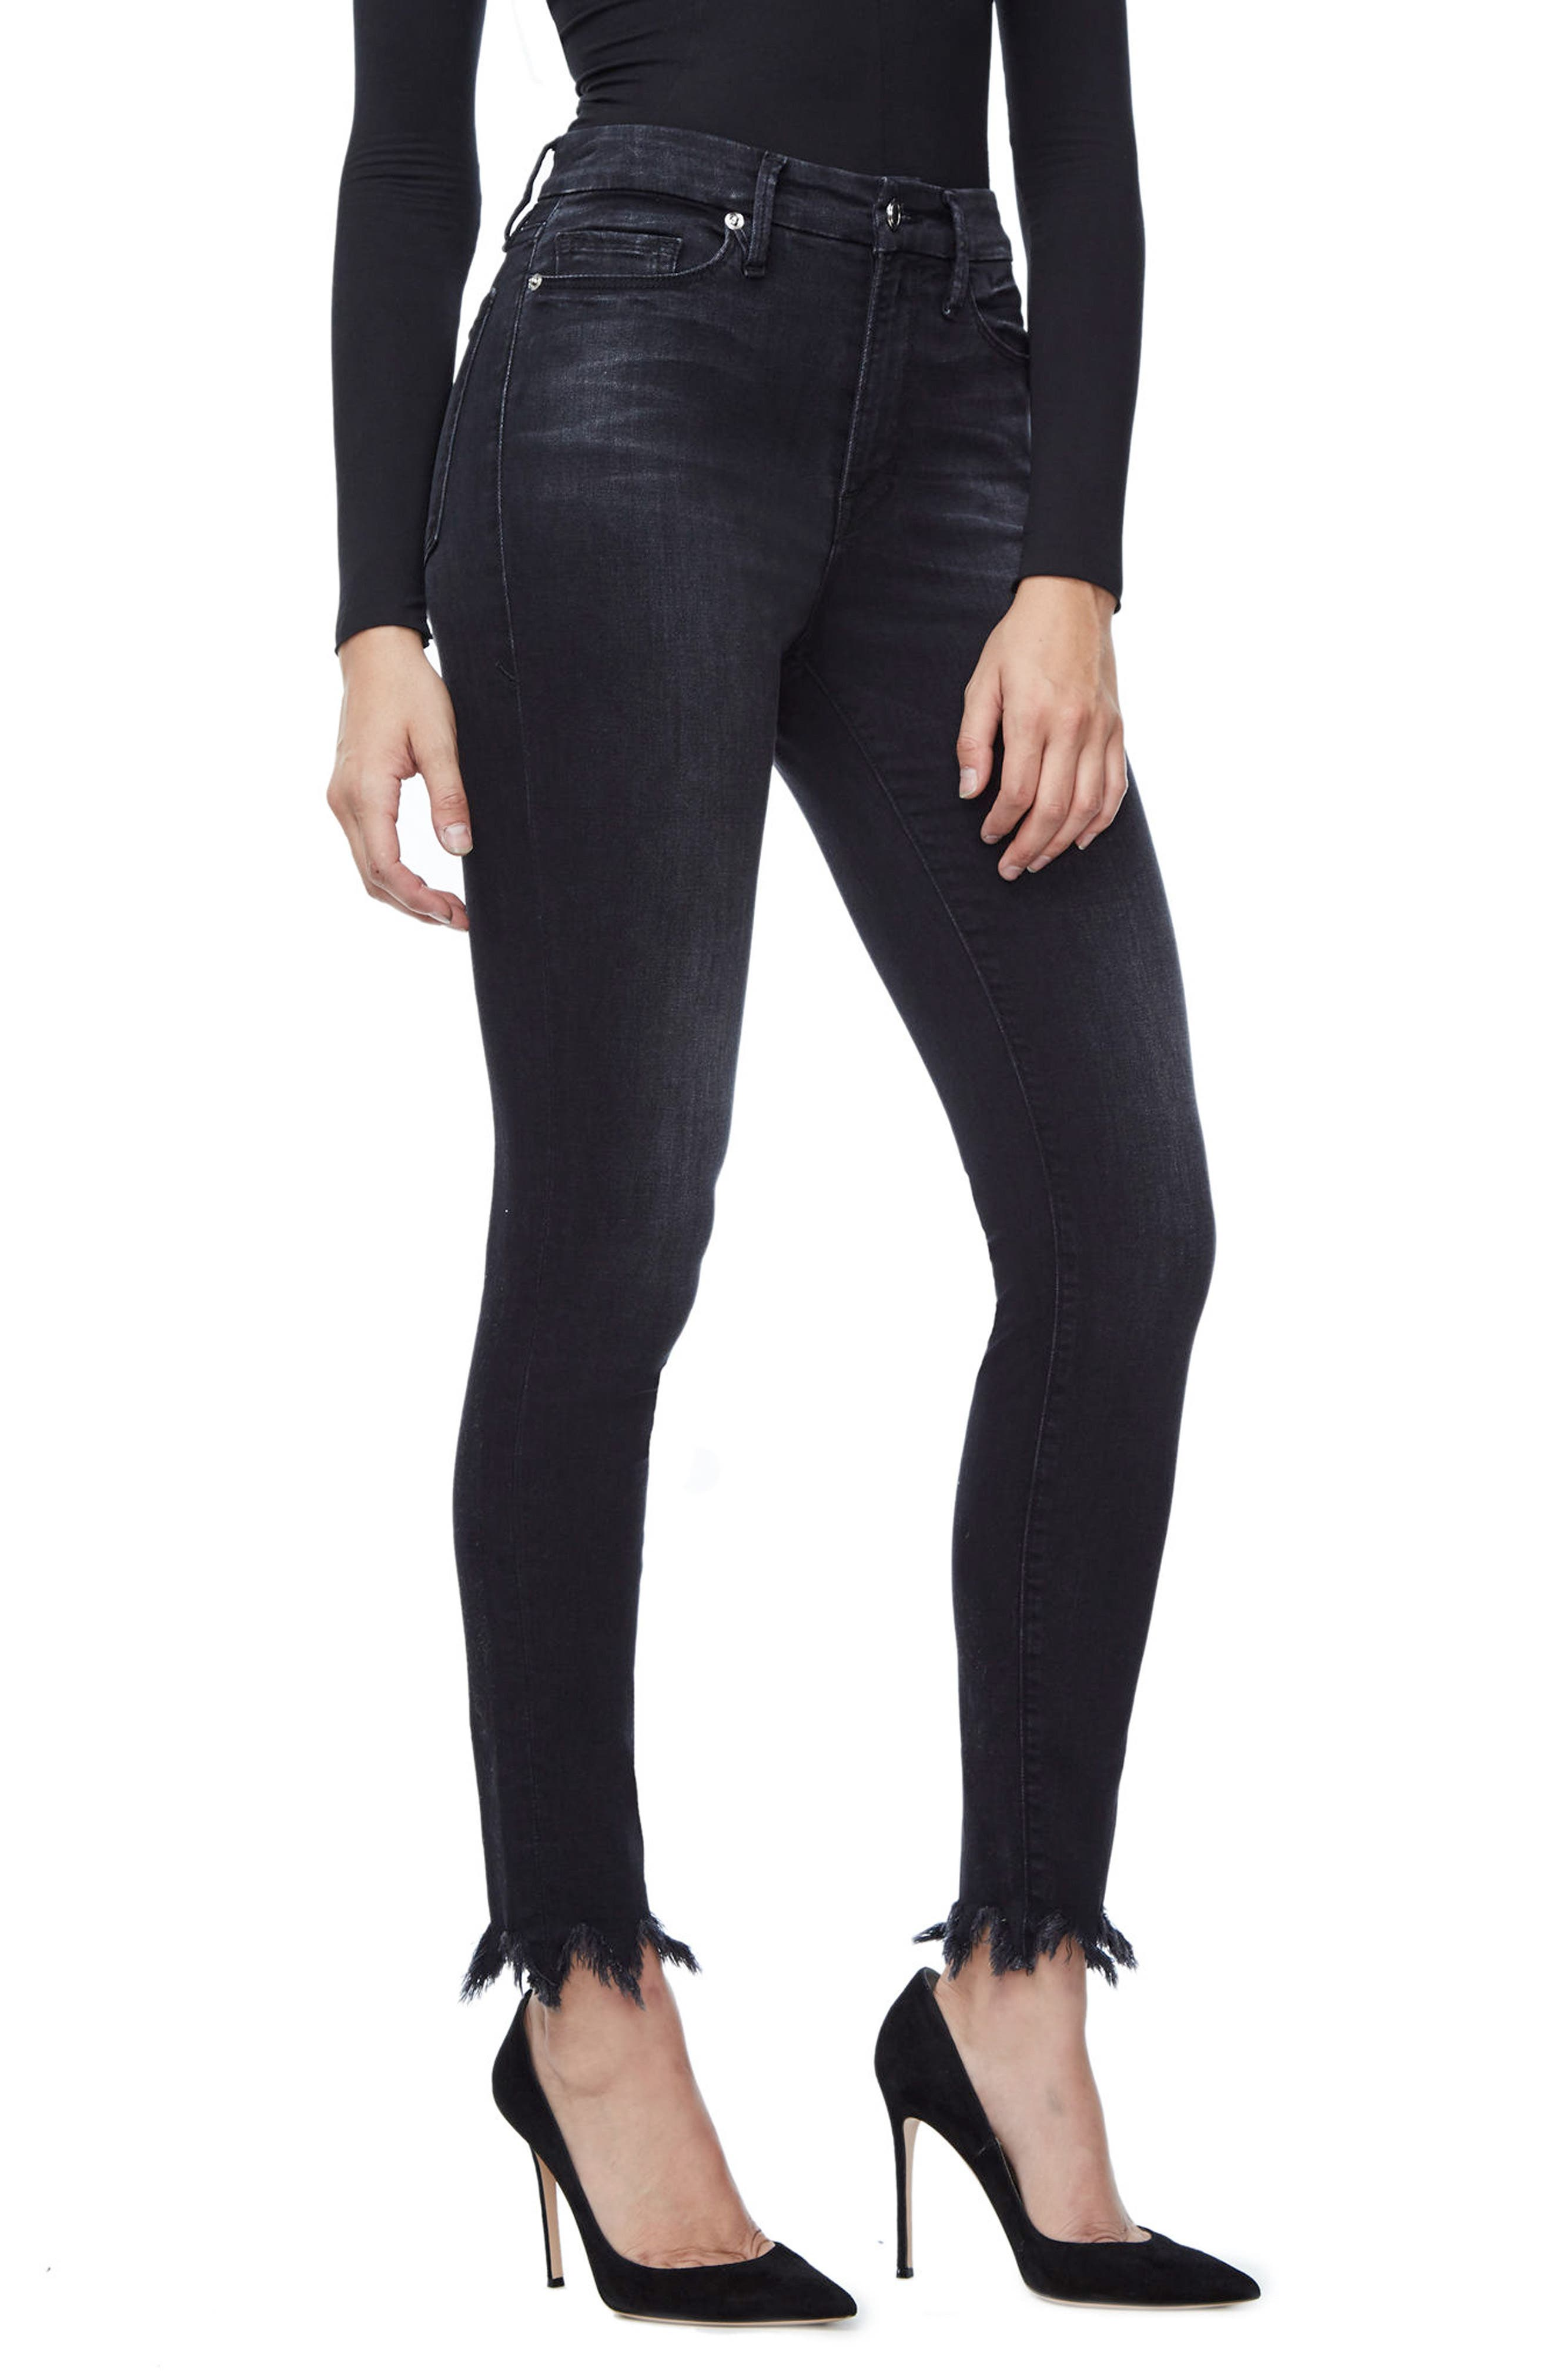 Main Image - Good American Good Waist Fray Hem Skinny Jeans (Black 012) (Extended Sizes)